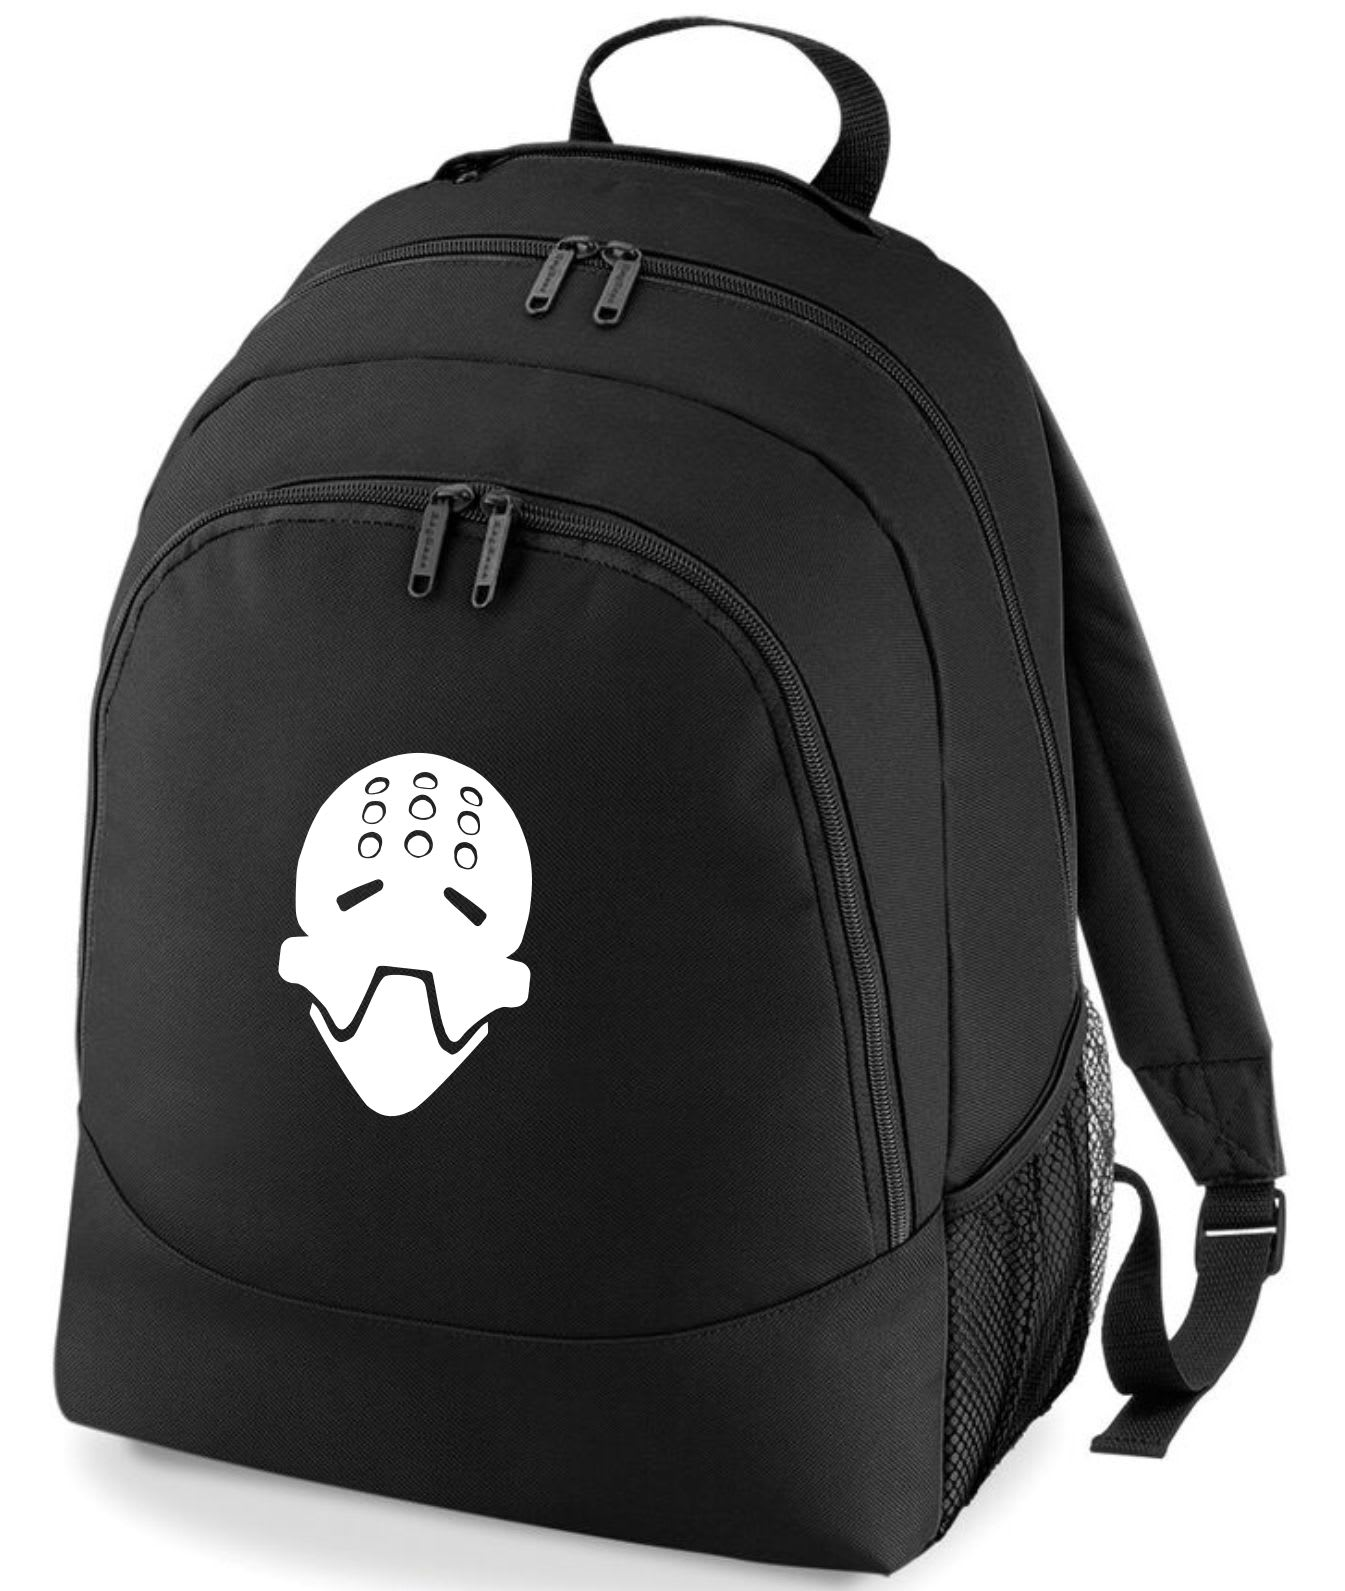 Overwatch Zenyetta Rucksack Bag